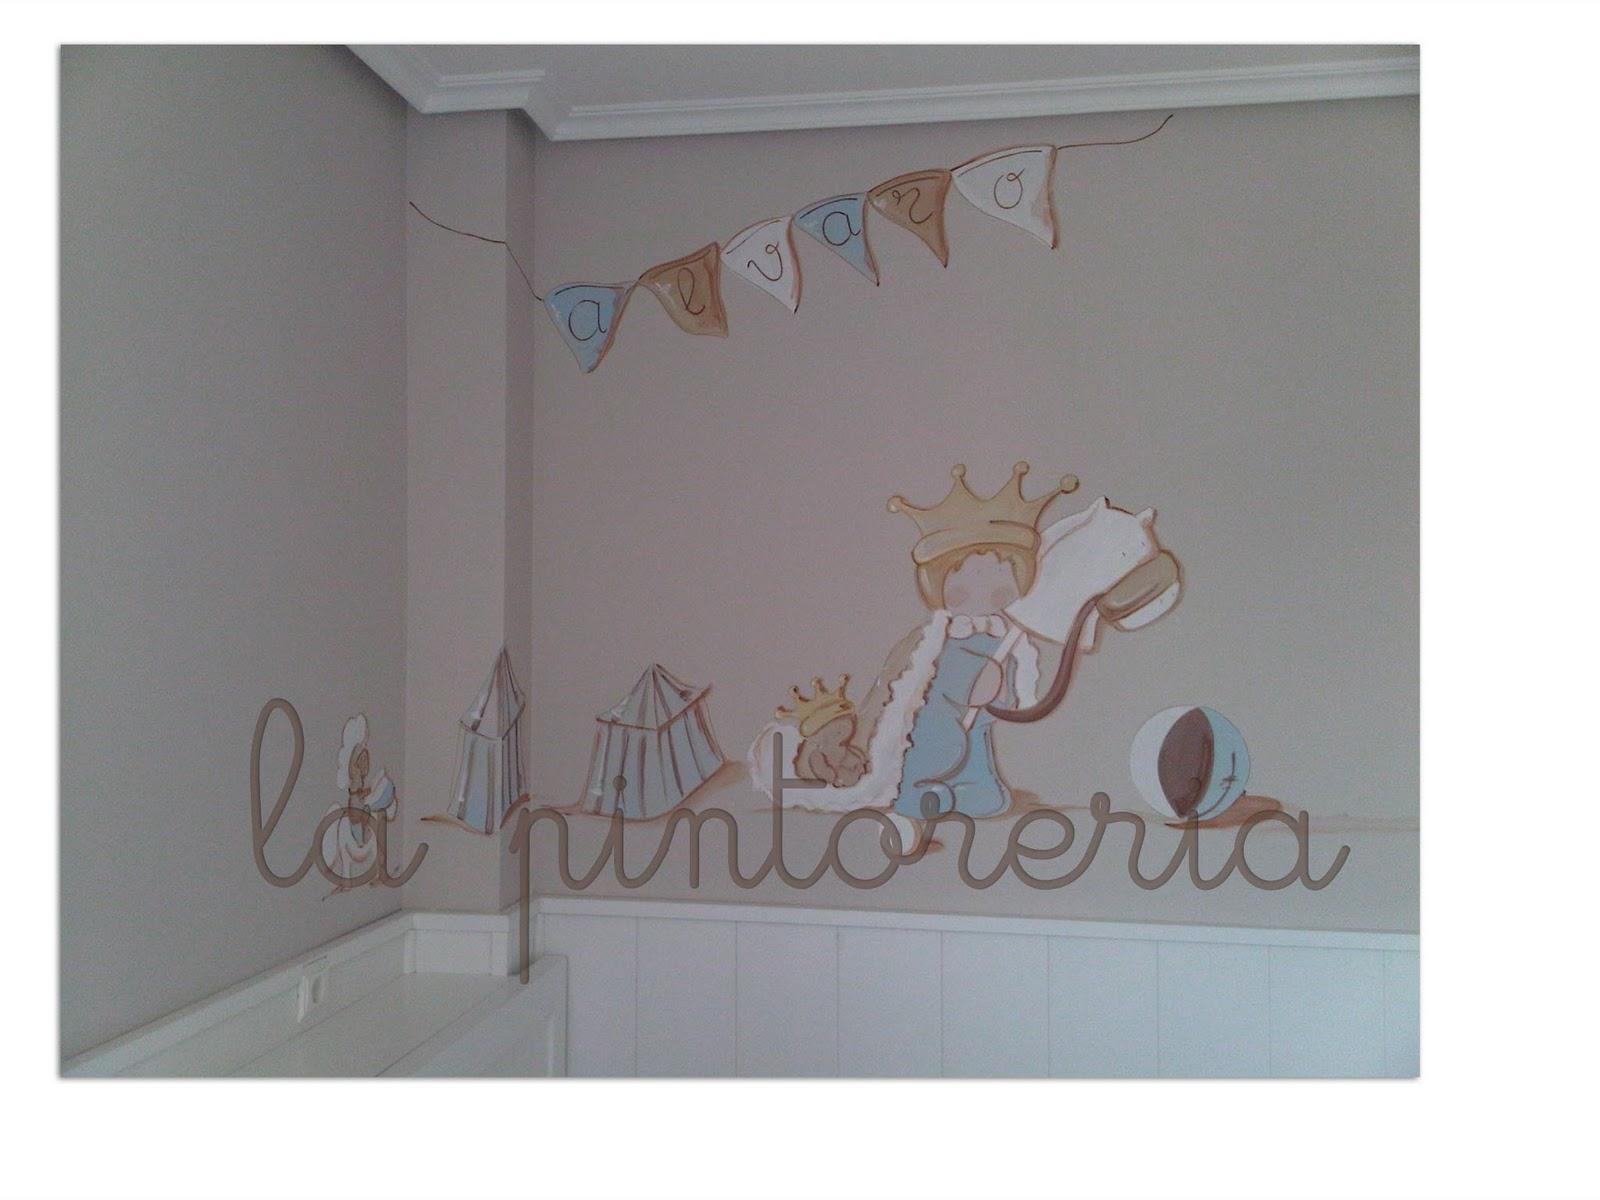 La pintorer a mural infantil para la habitaci n de alvaro for Mural para habitacion